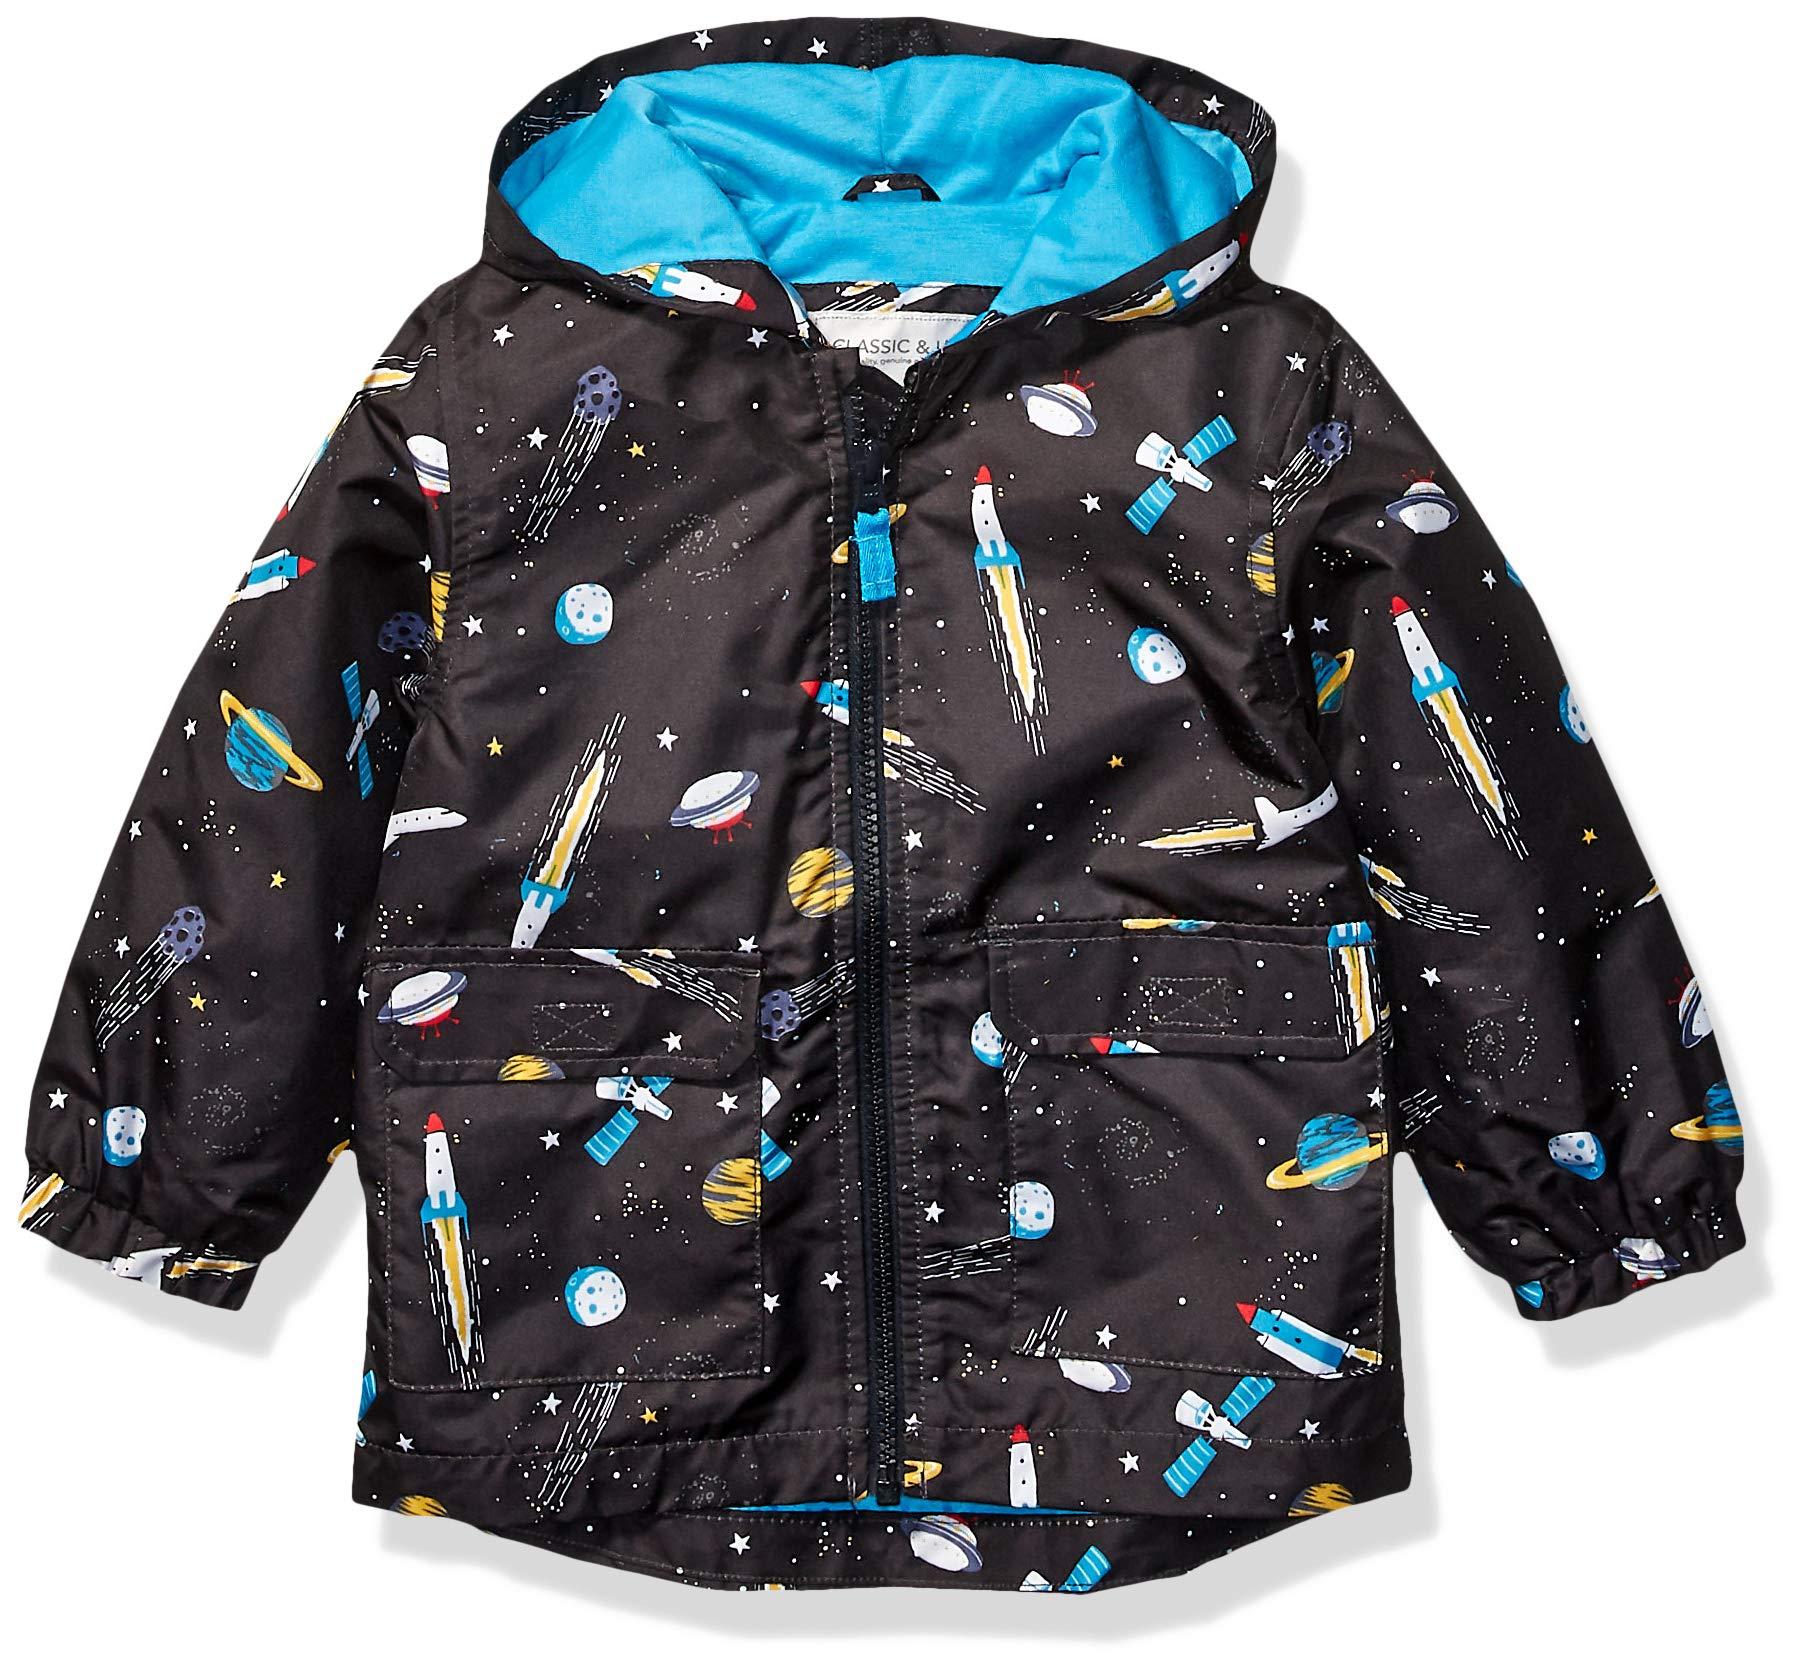 Carter's Boys' Toddler Favorite Rainslicker Rain Jacket, Space Ship Black, 4T by Carter's